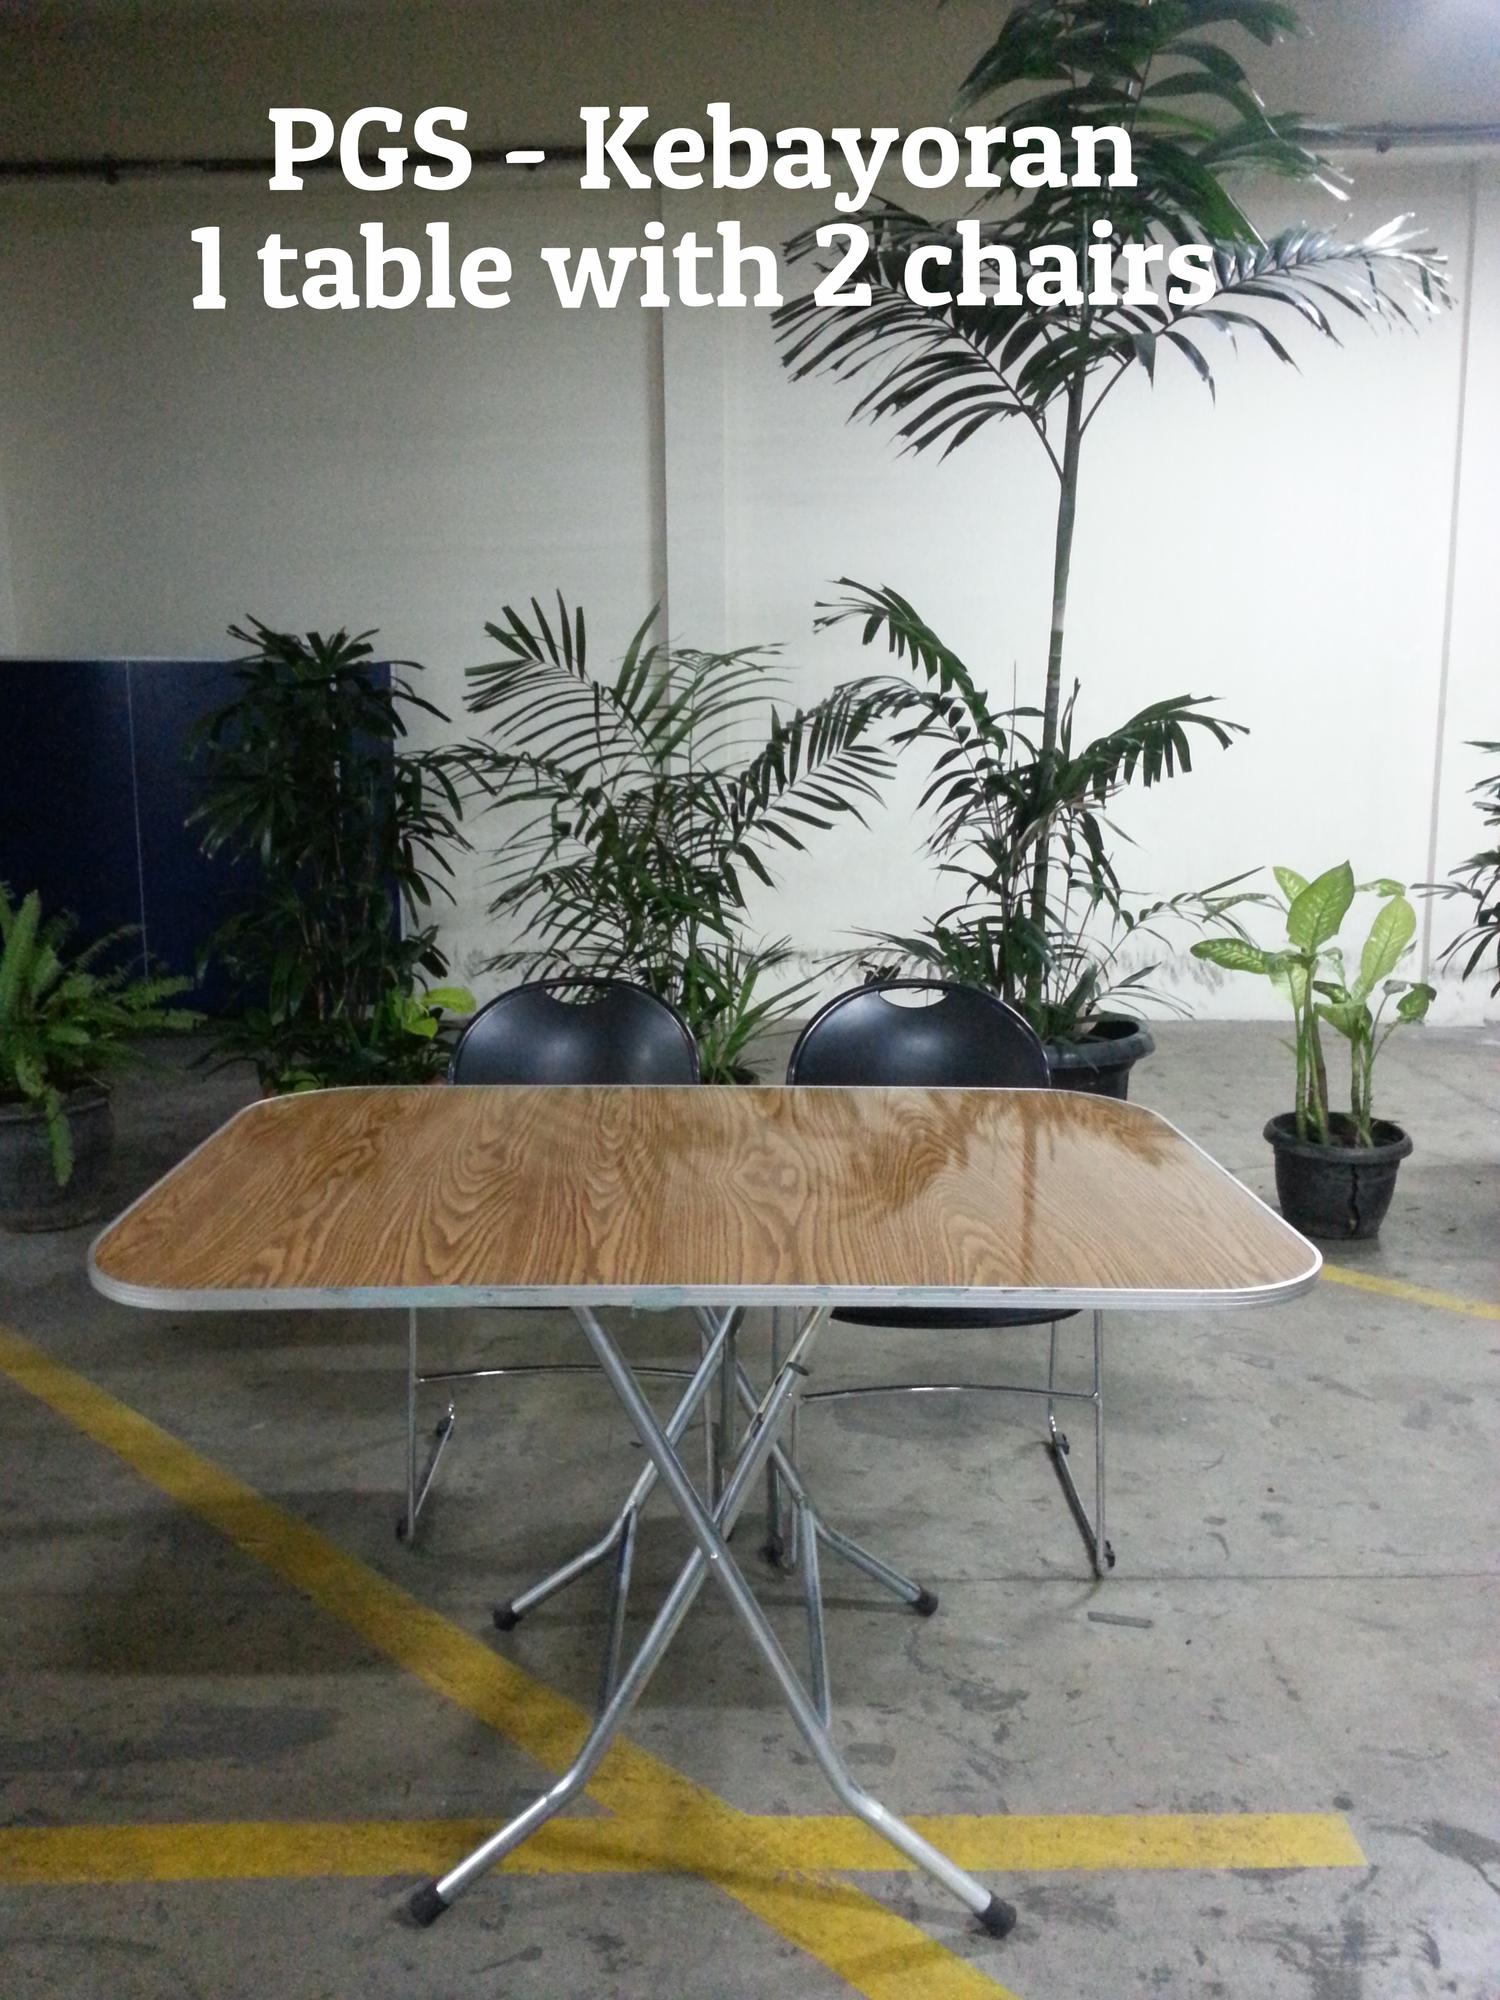 PGS - Kebayoran  1 table with 2 chairs